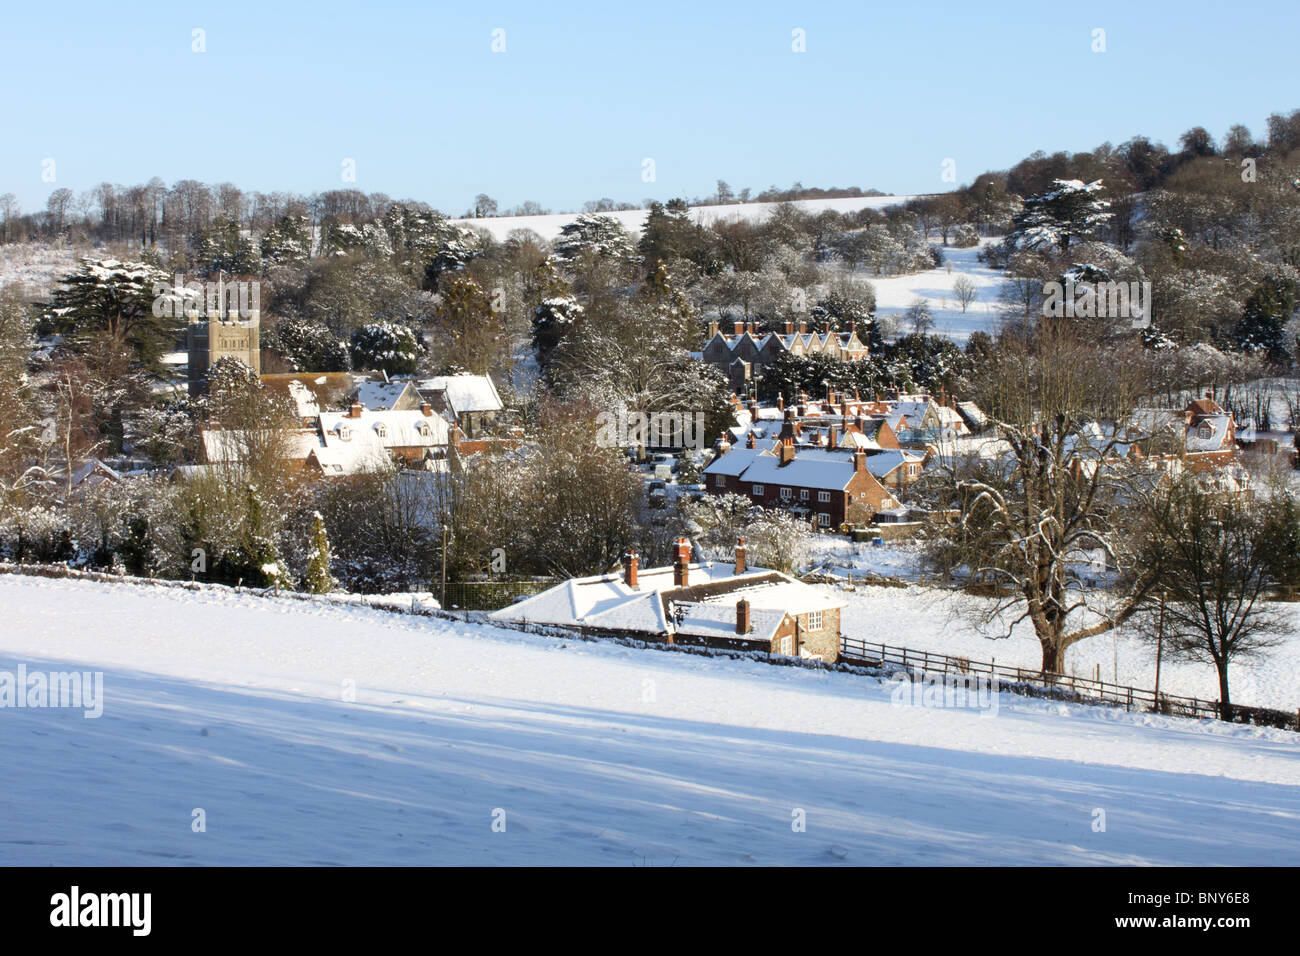 Hambleden village in the snow, Chiltern Hills, Buckinghamshire, England, UK - Stock Image